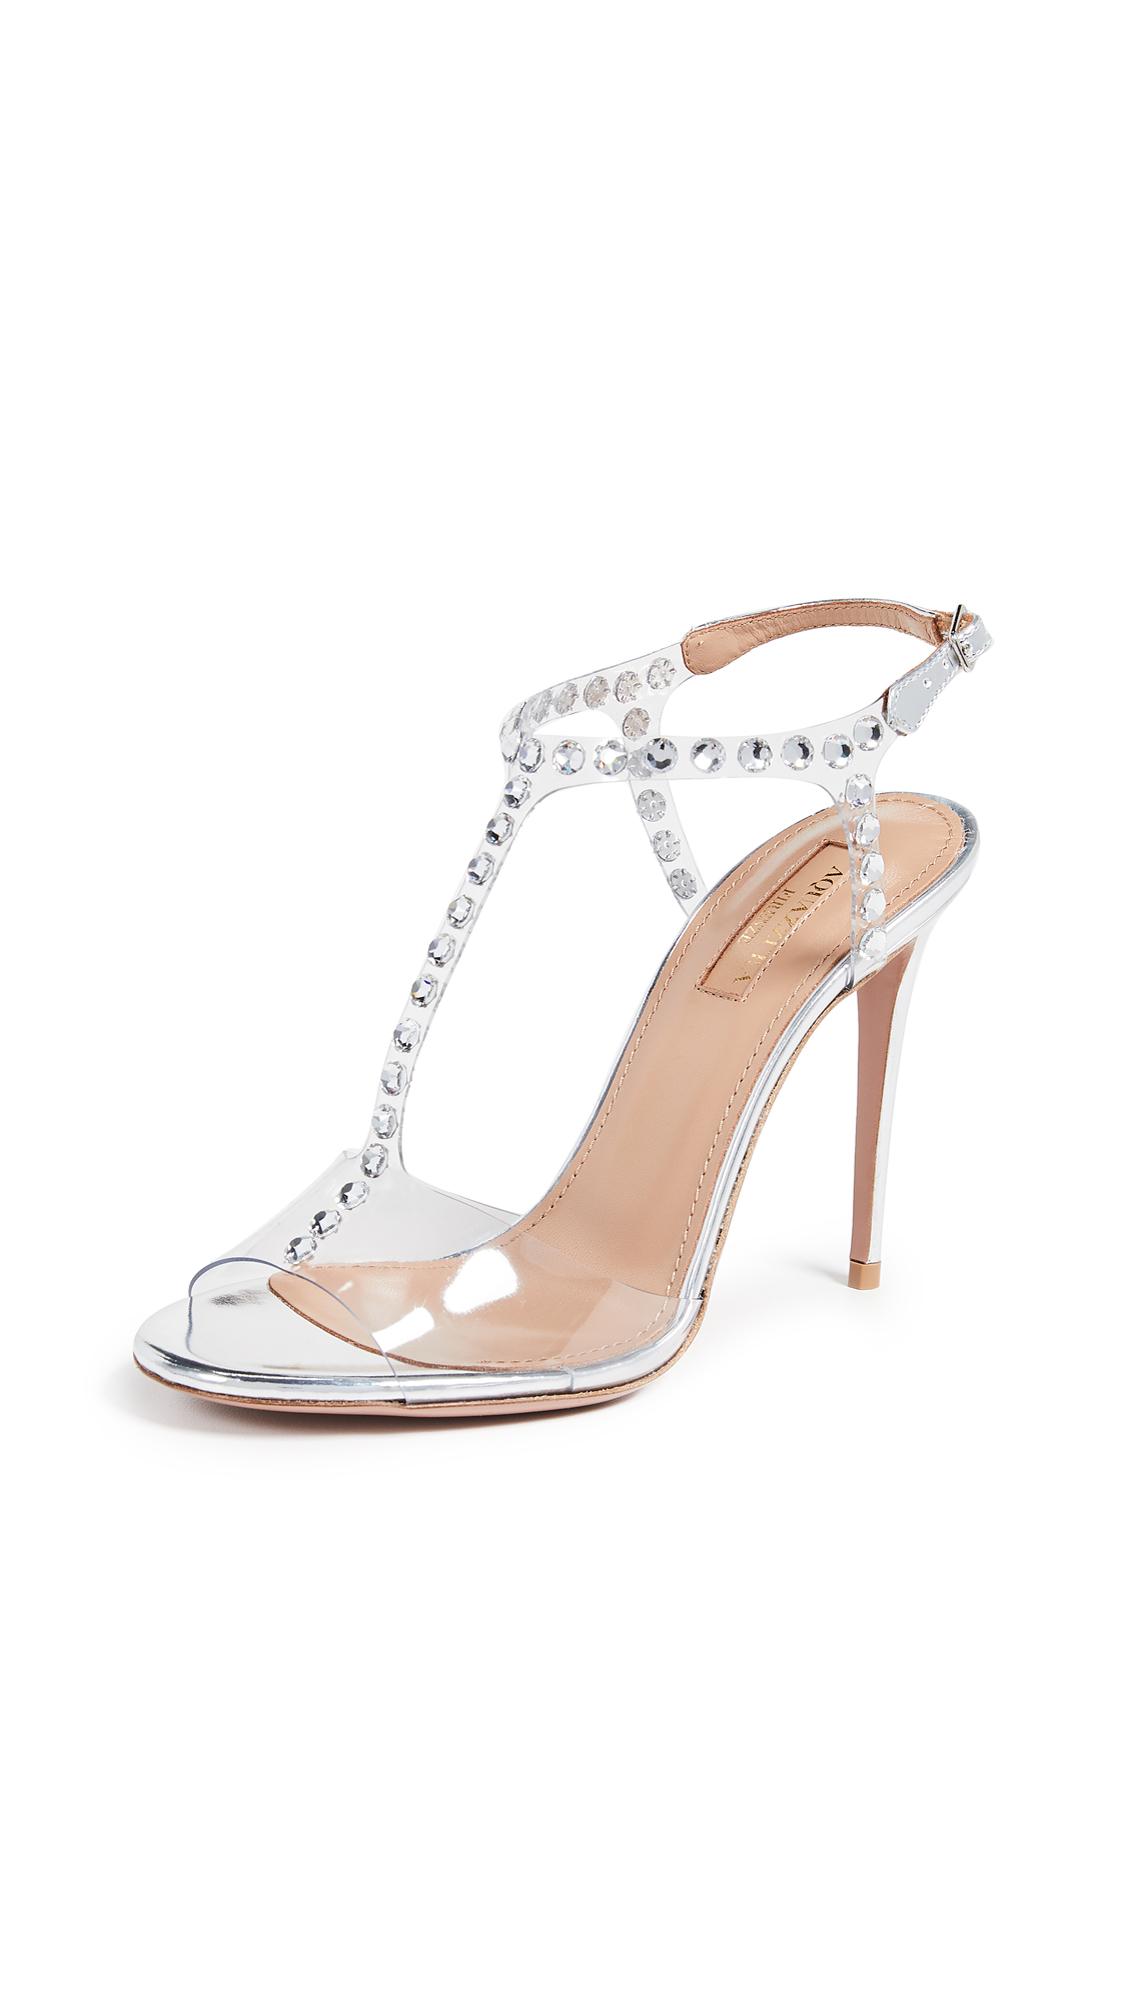 Aquazzura Shine 105mm Sandals - Silver